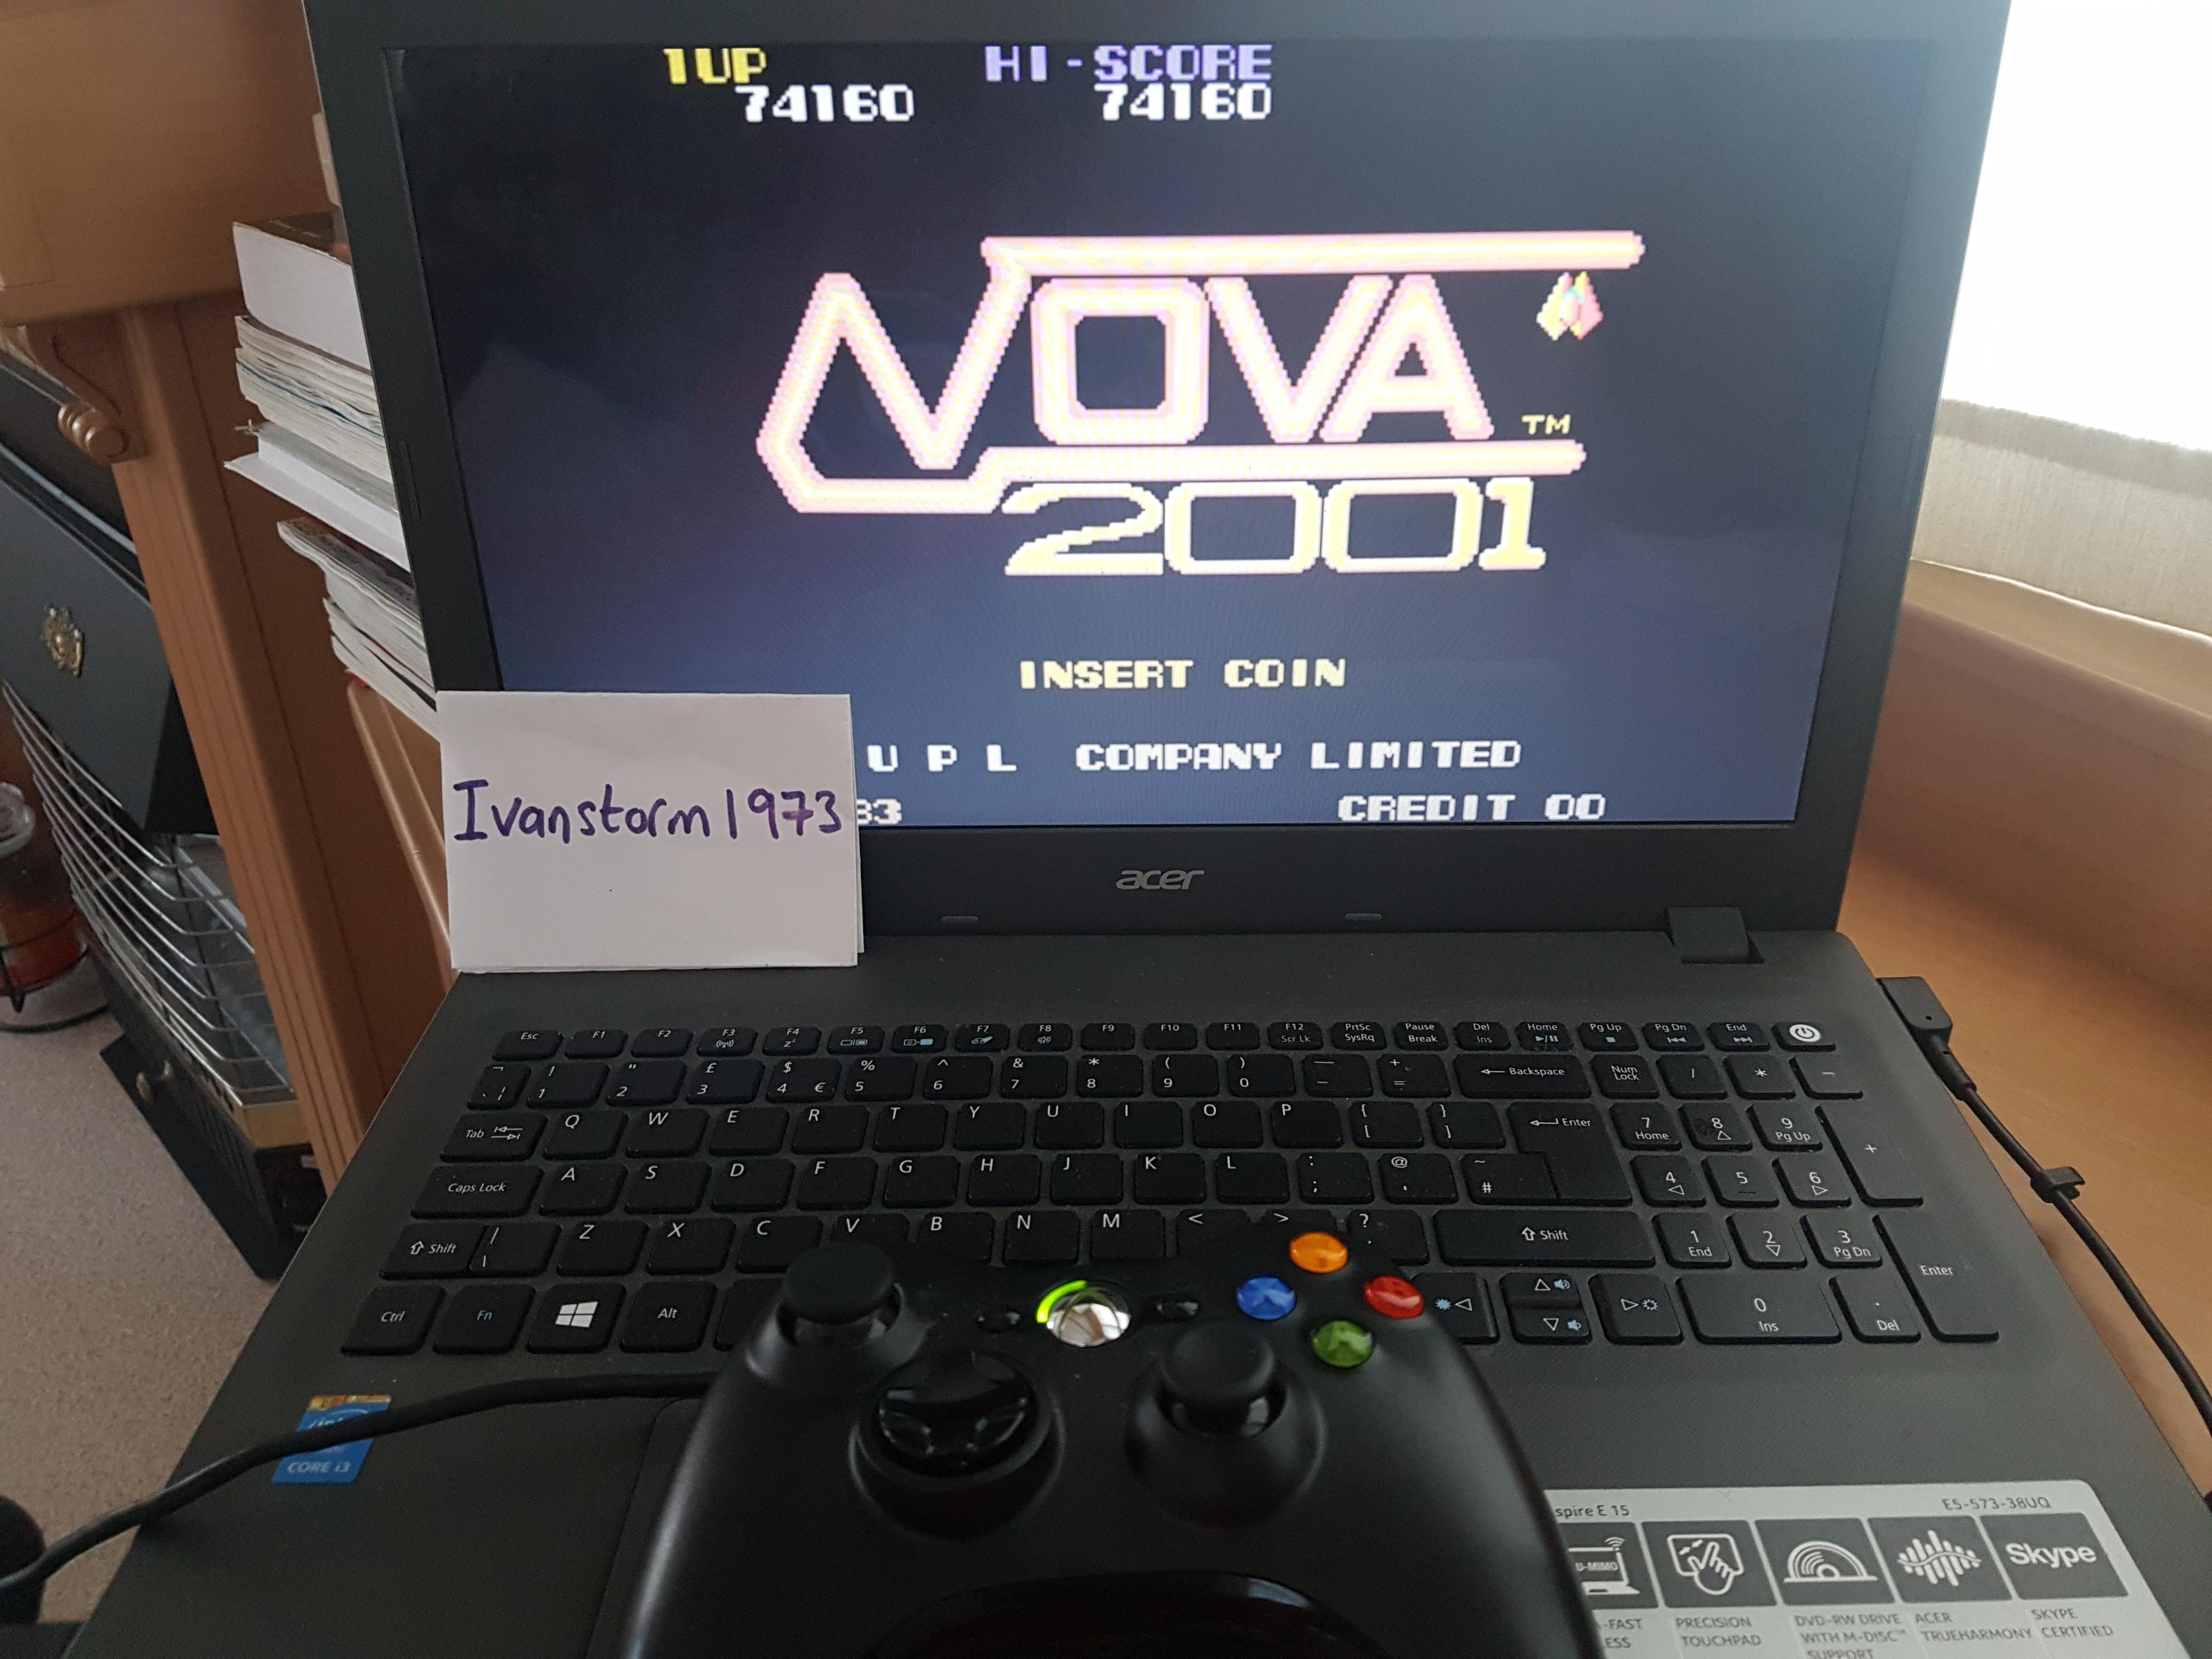 Ivanstorm1973: Nova 2001 (Japan) [Nova2001] (Arcade Emulated / M.A.M.E.) 74,160 points on 2017-07-26 14:51:25